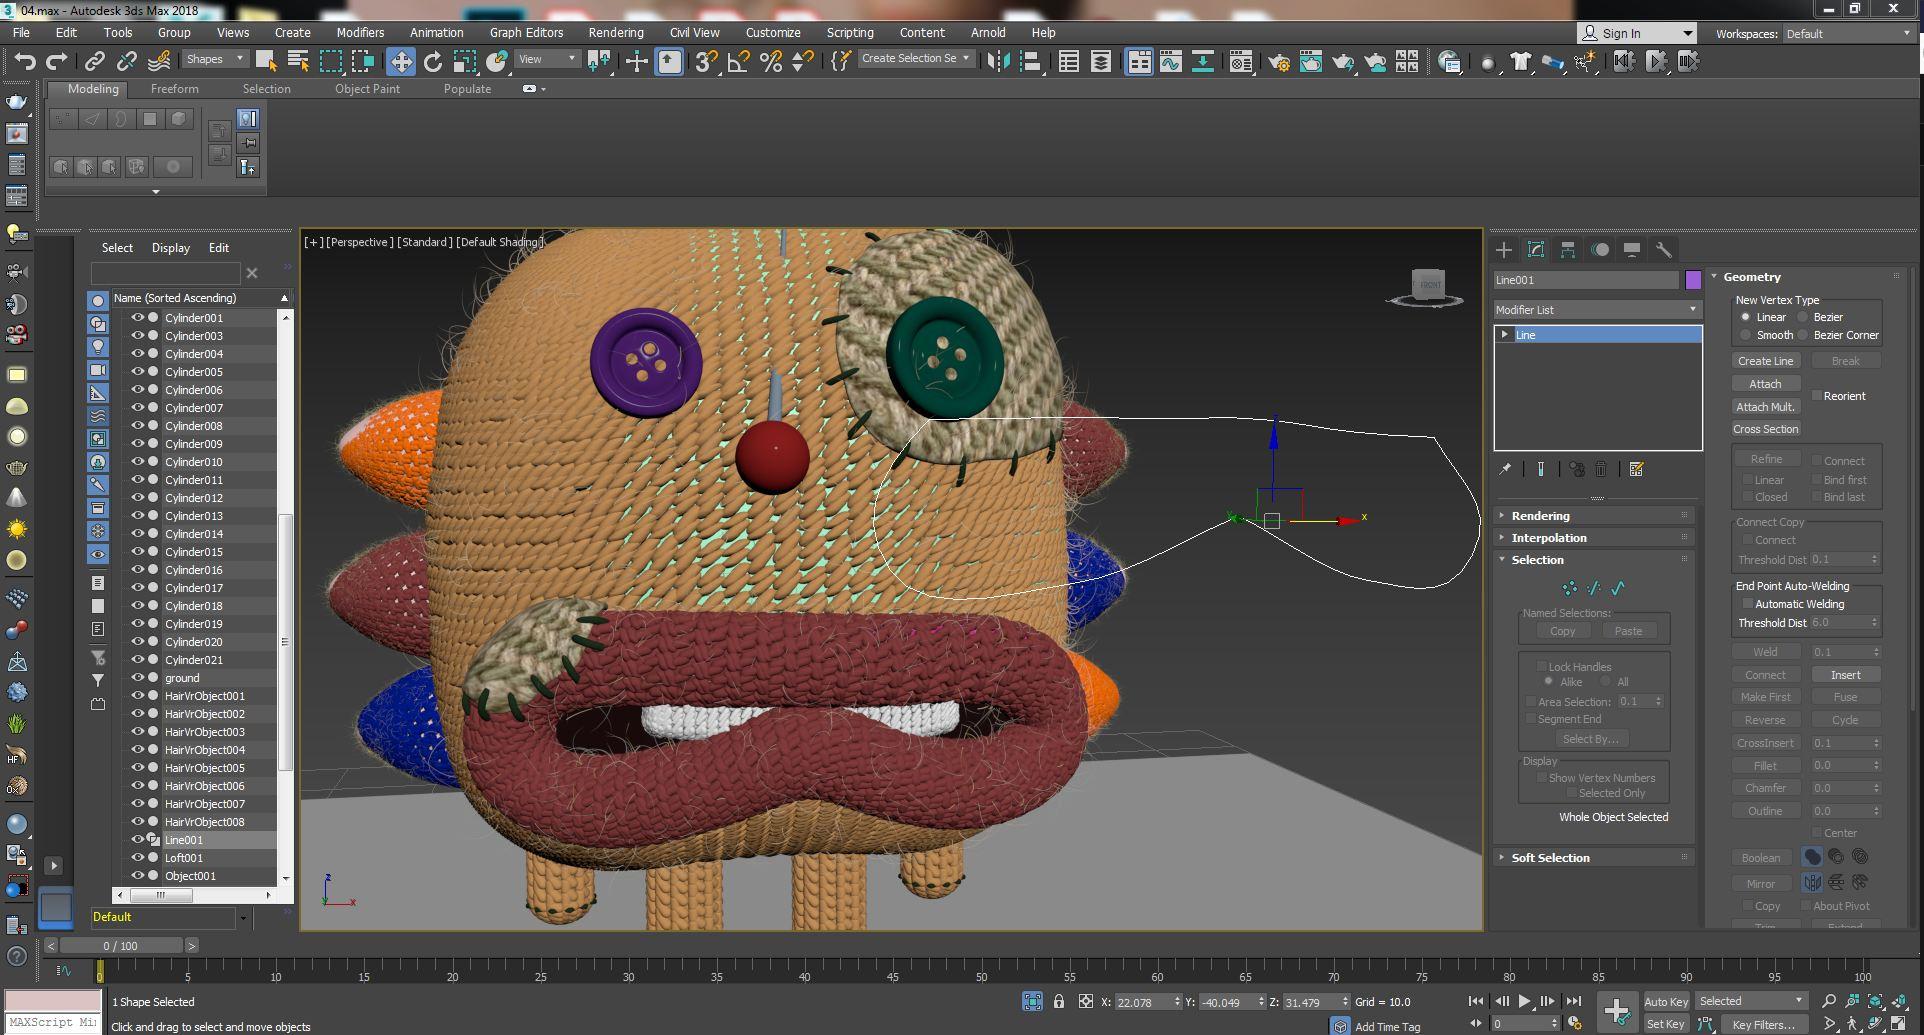 Process Screen shots